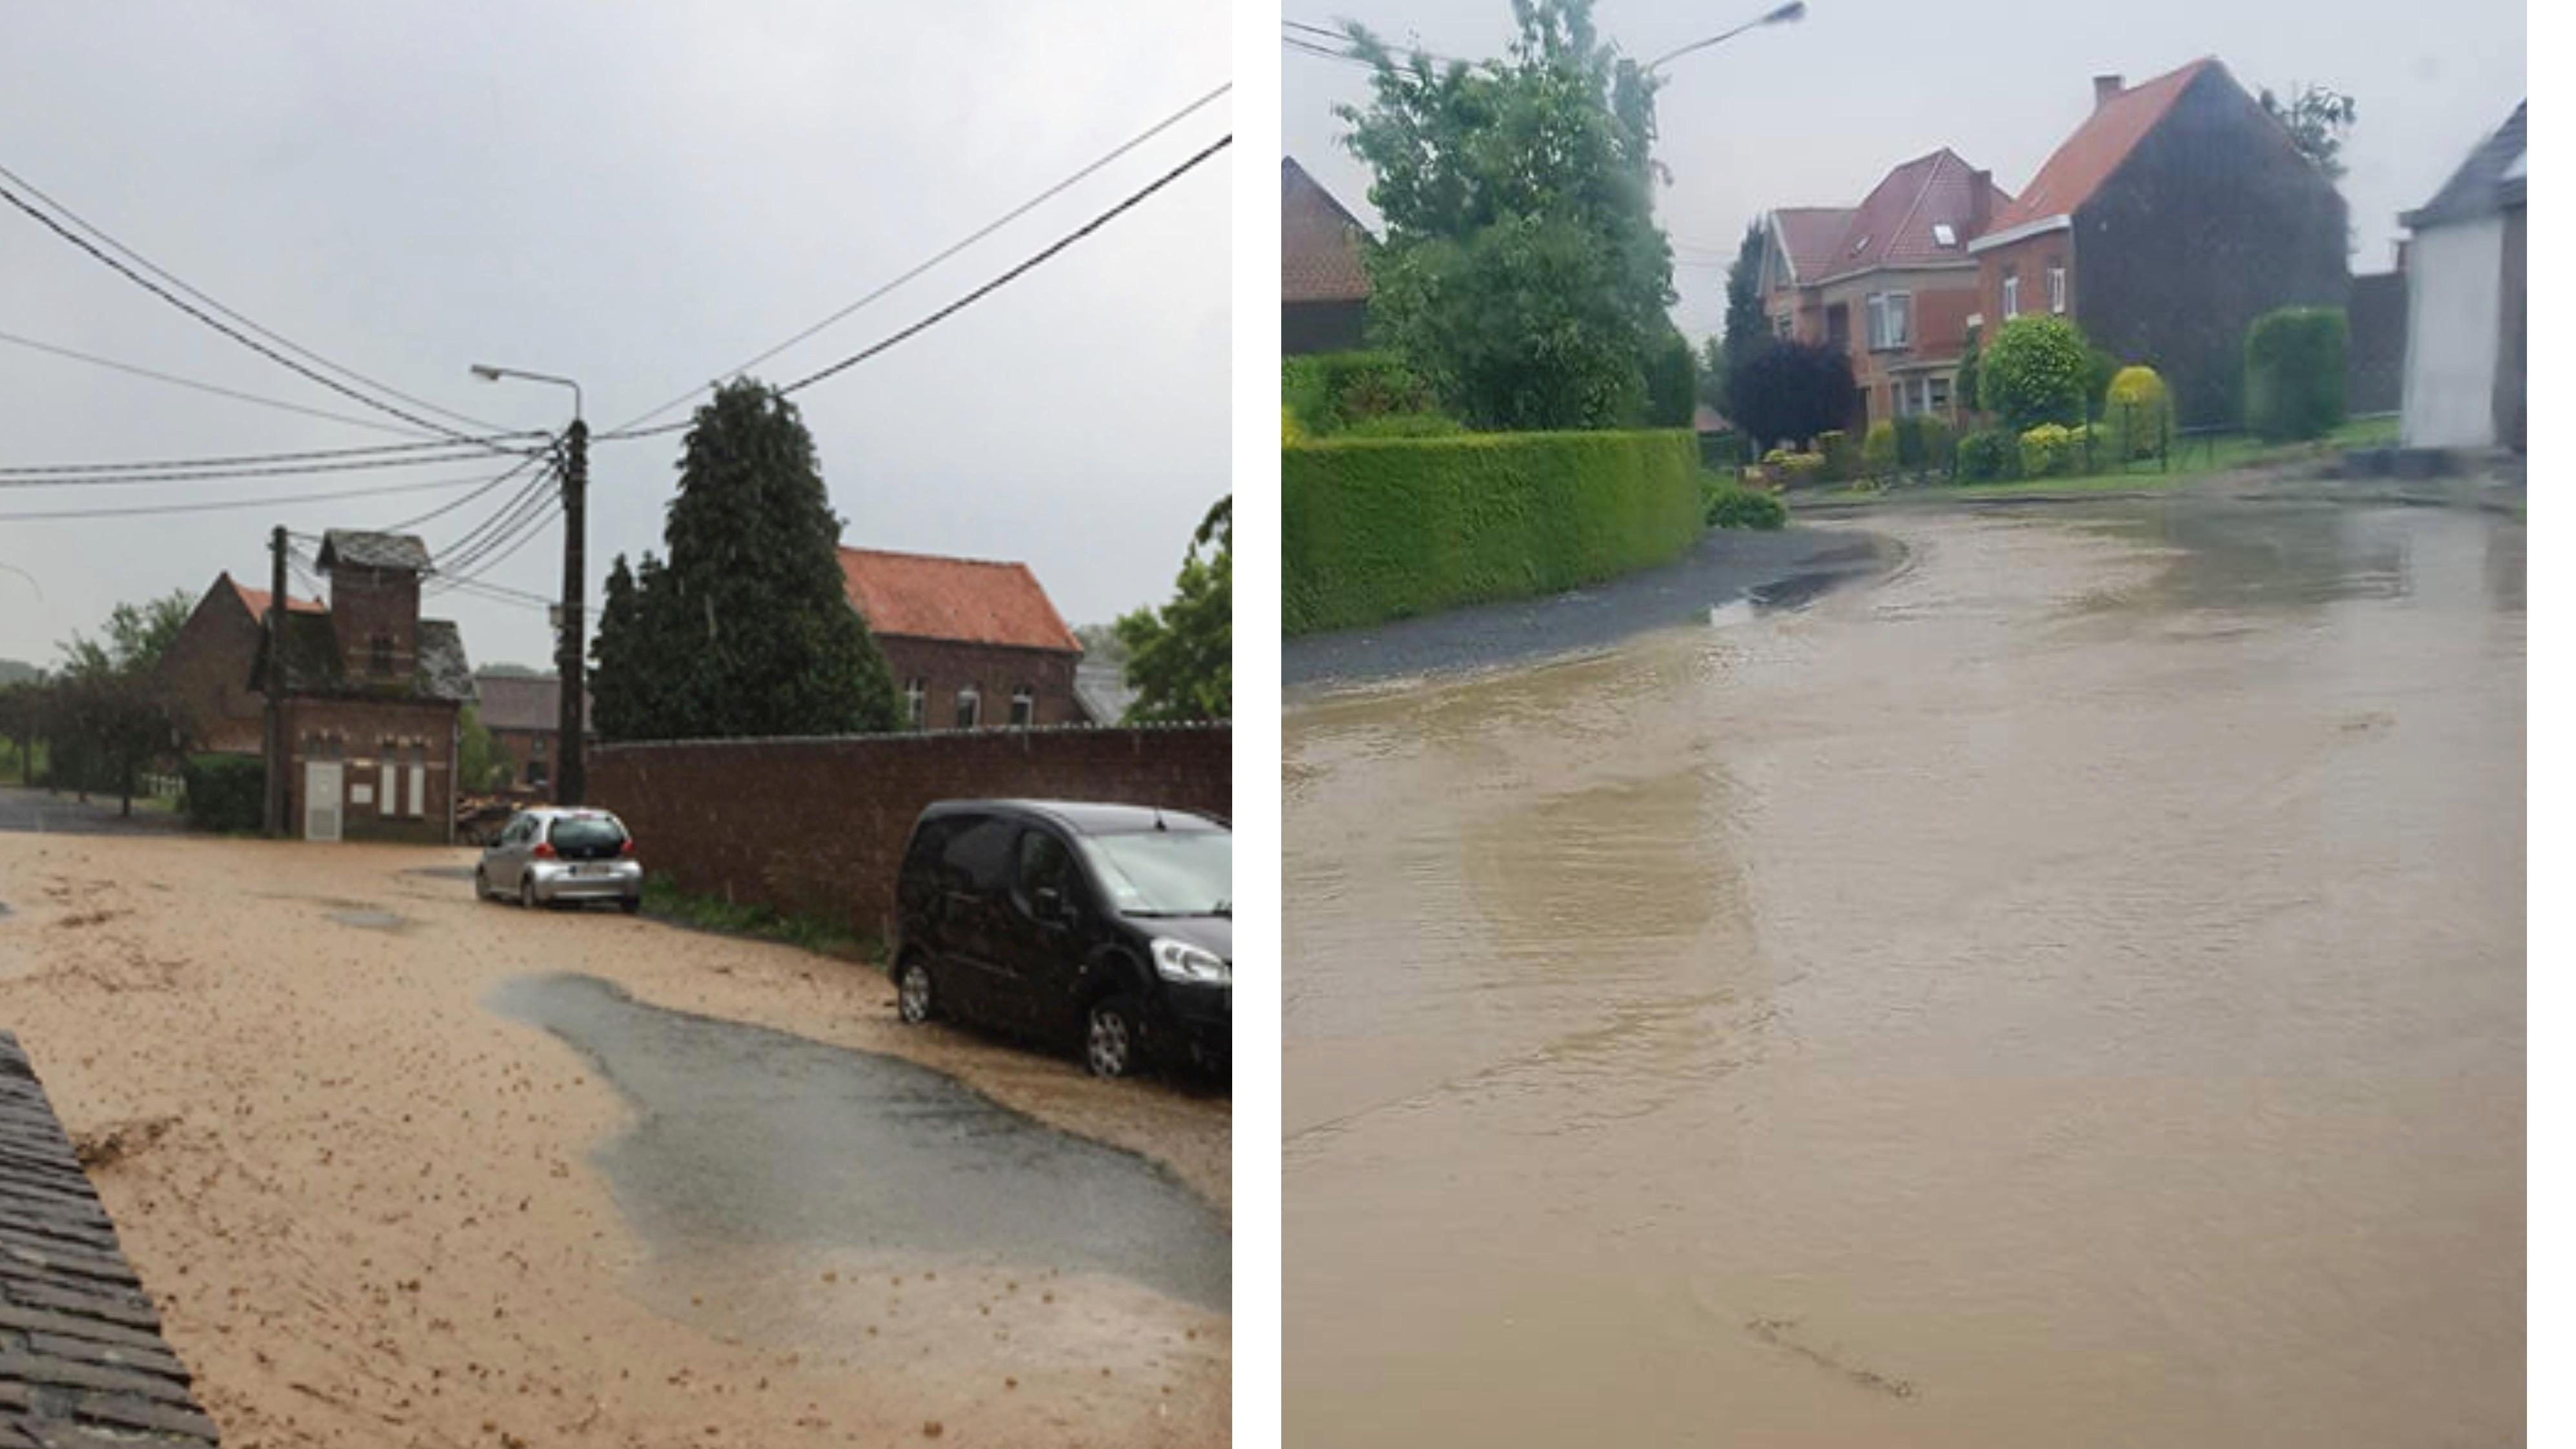 Orage : Des coulées de boue en Wallonie picarde